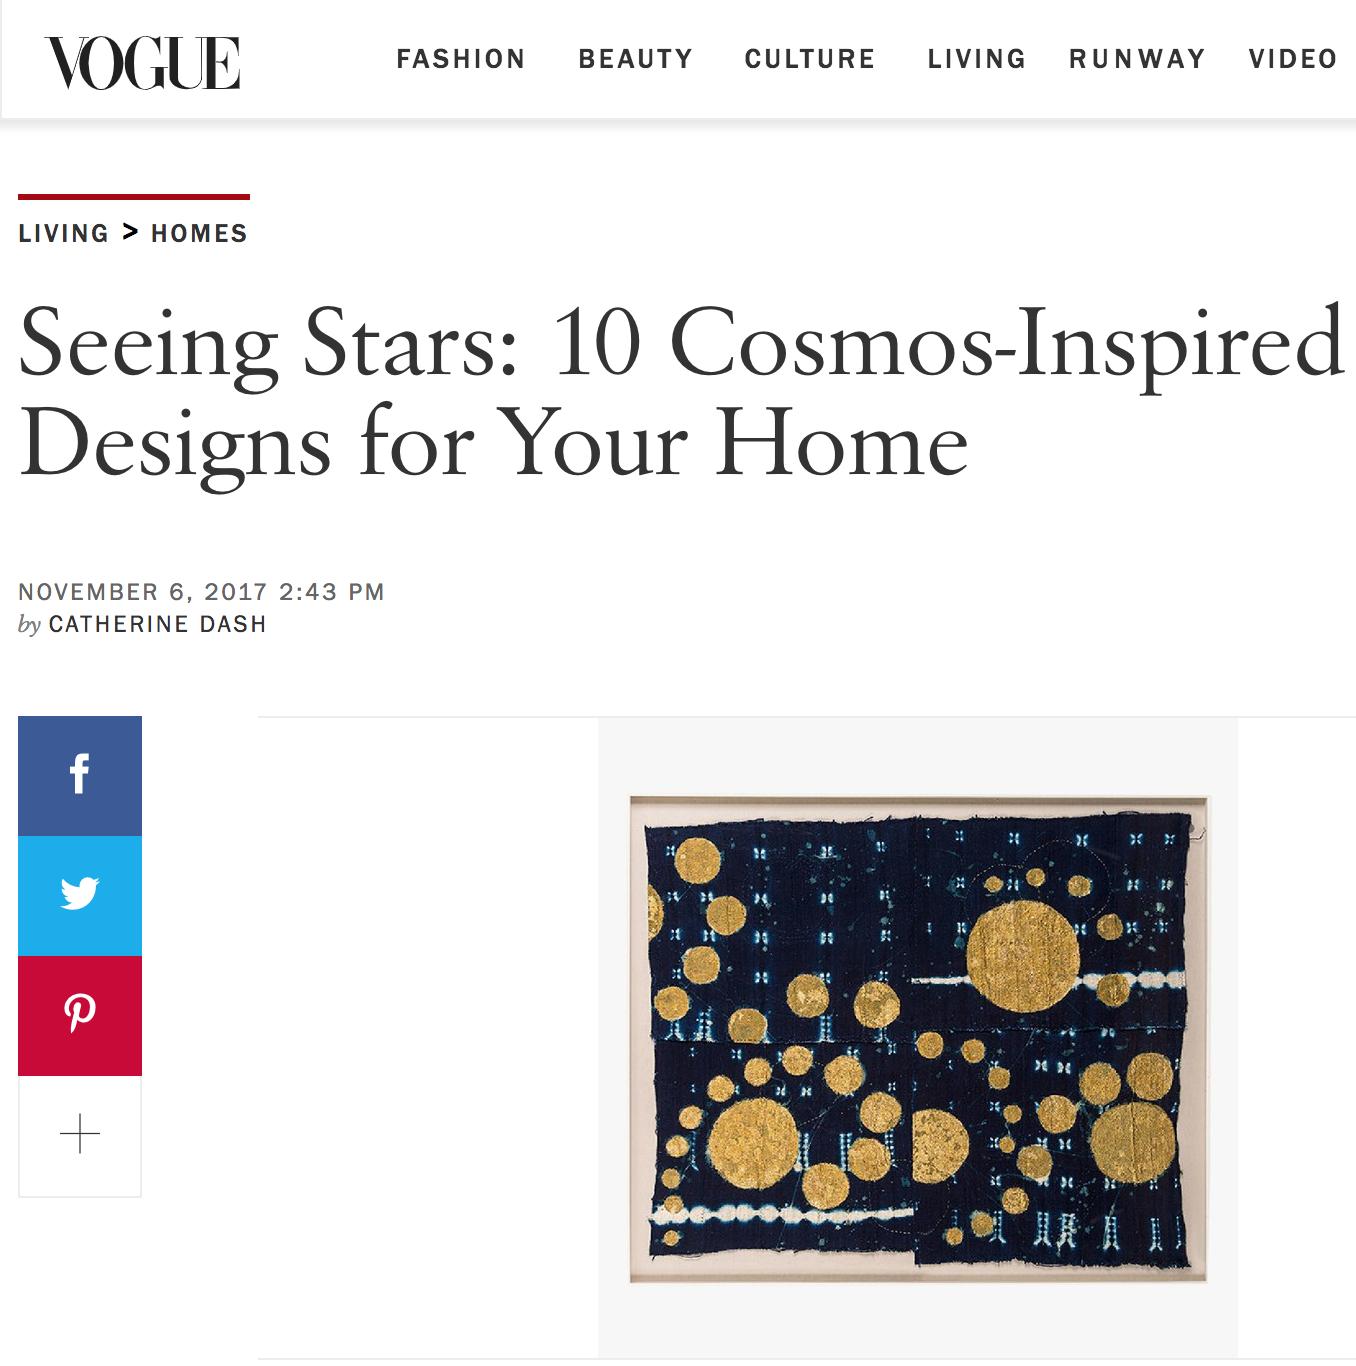 10 Cosmo-Inspired Designs for Your Home  Vogue.com - November 2017